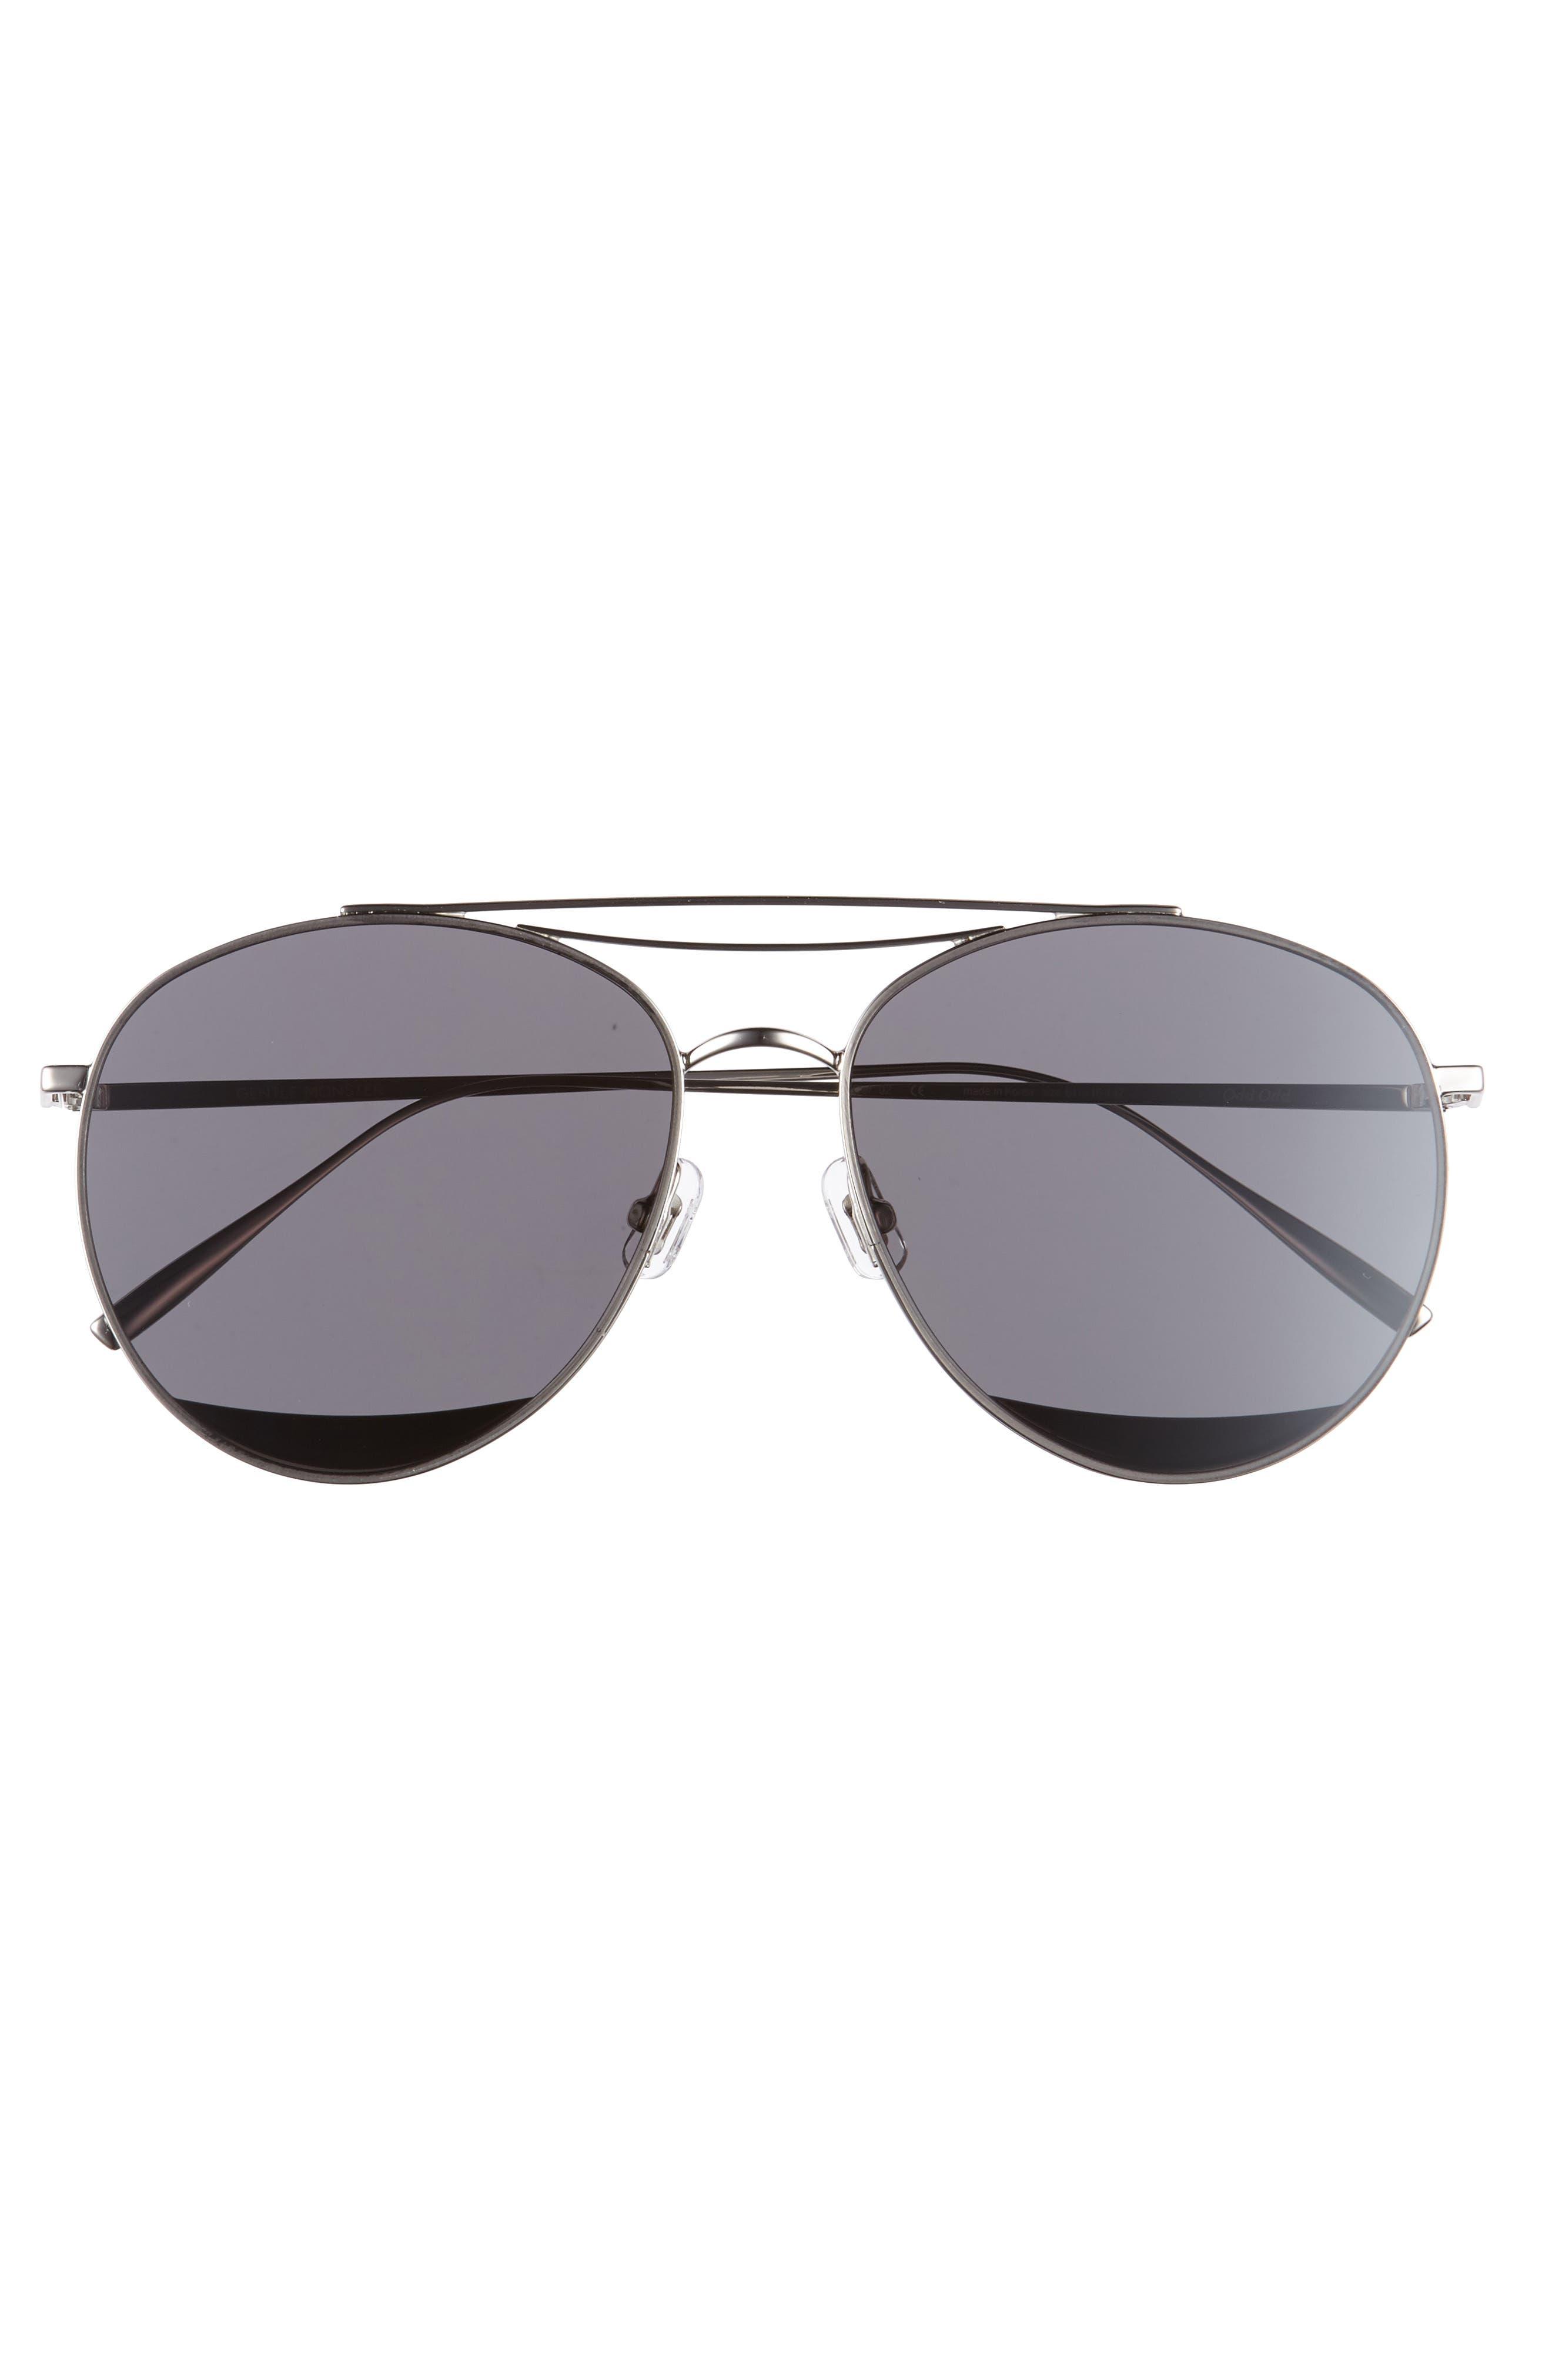 Odd Odd 61mm Aviator Sunglasses,                             Alternate thumbnail 3, color,                             040